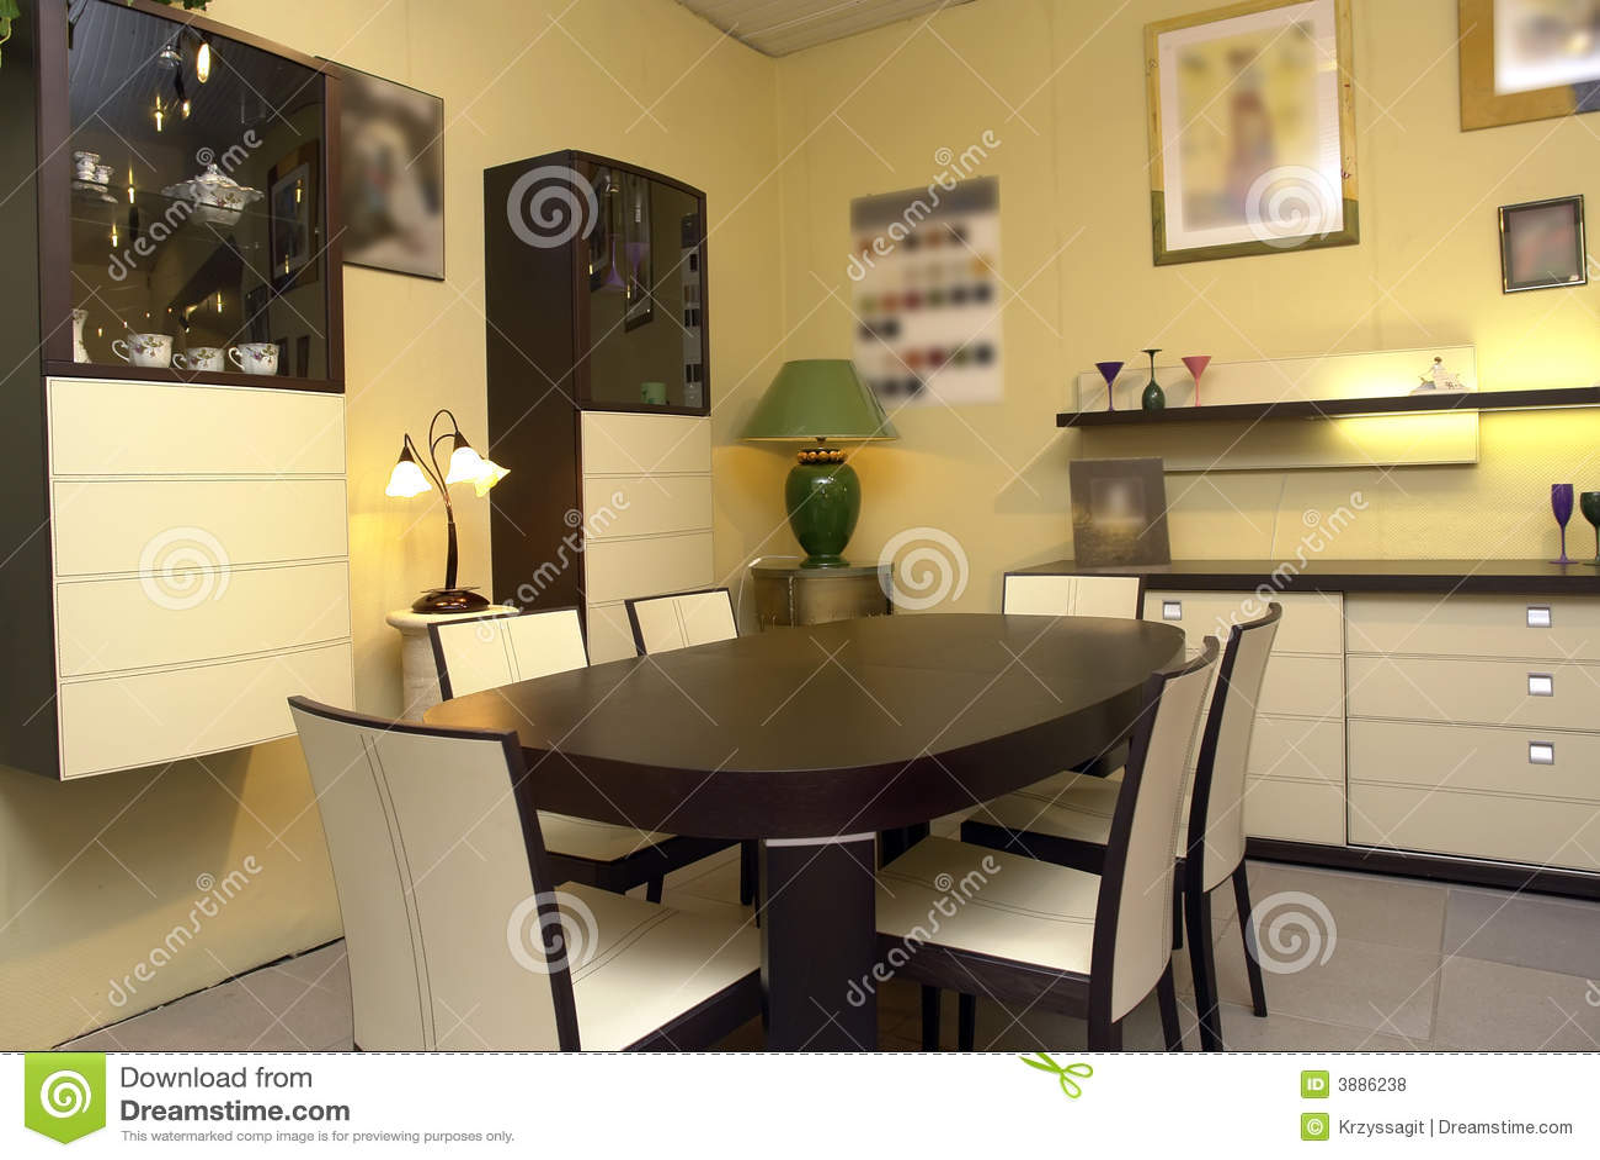 Moderne eetkamer royalty vrije stock foto 39 s beeld 3886238 - Moderne eetkamer ...